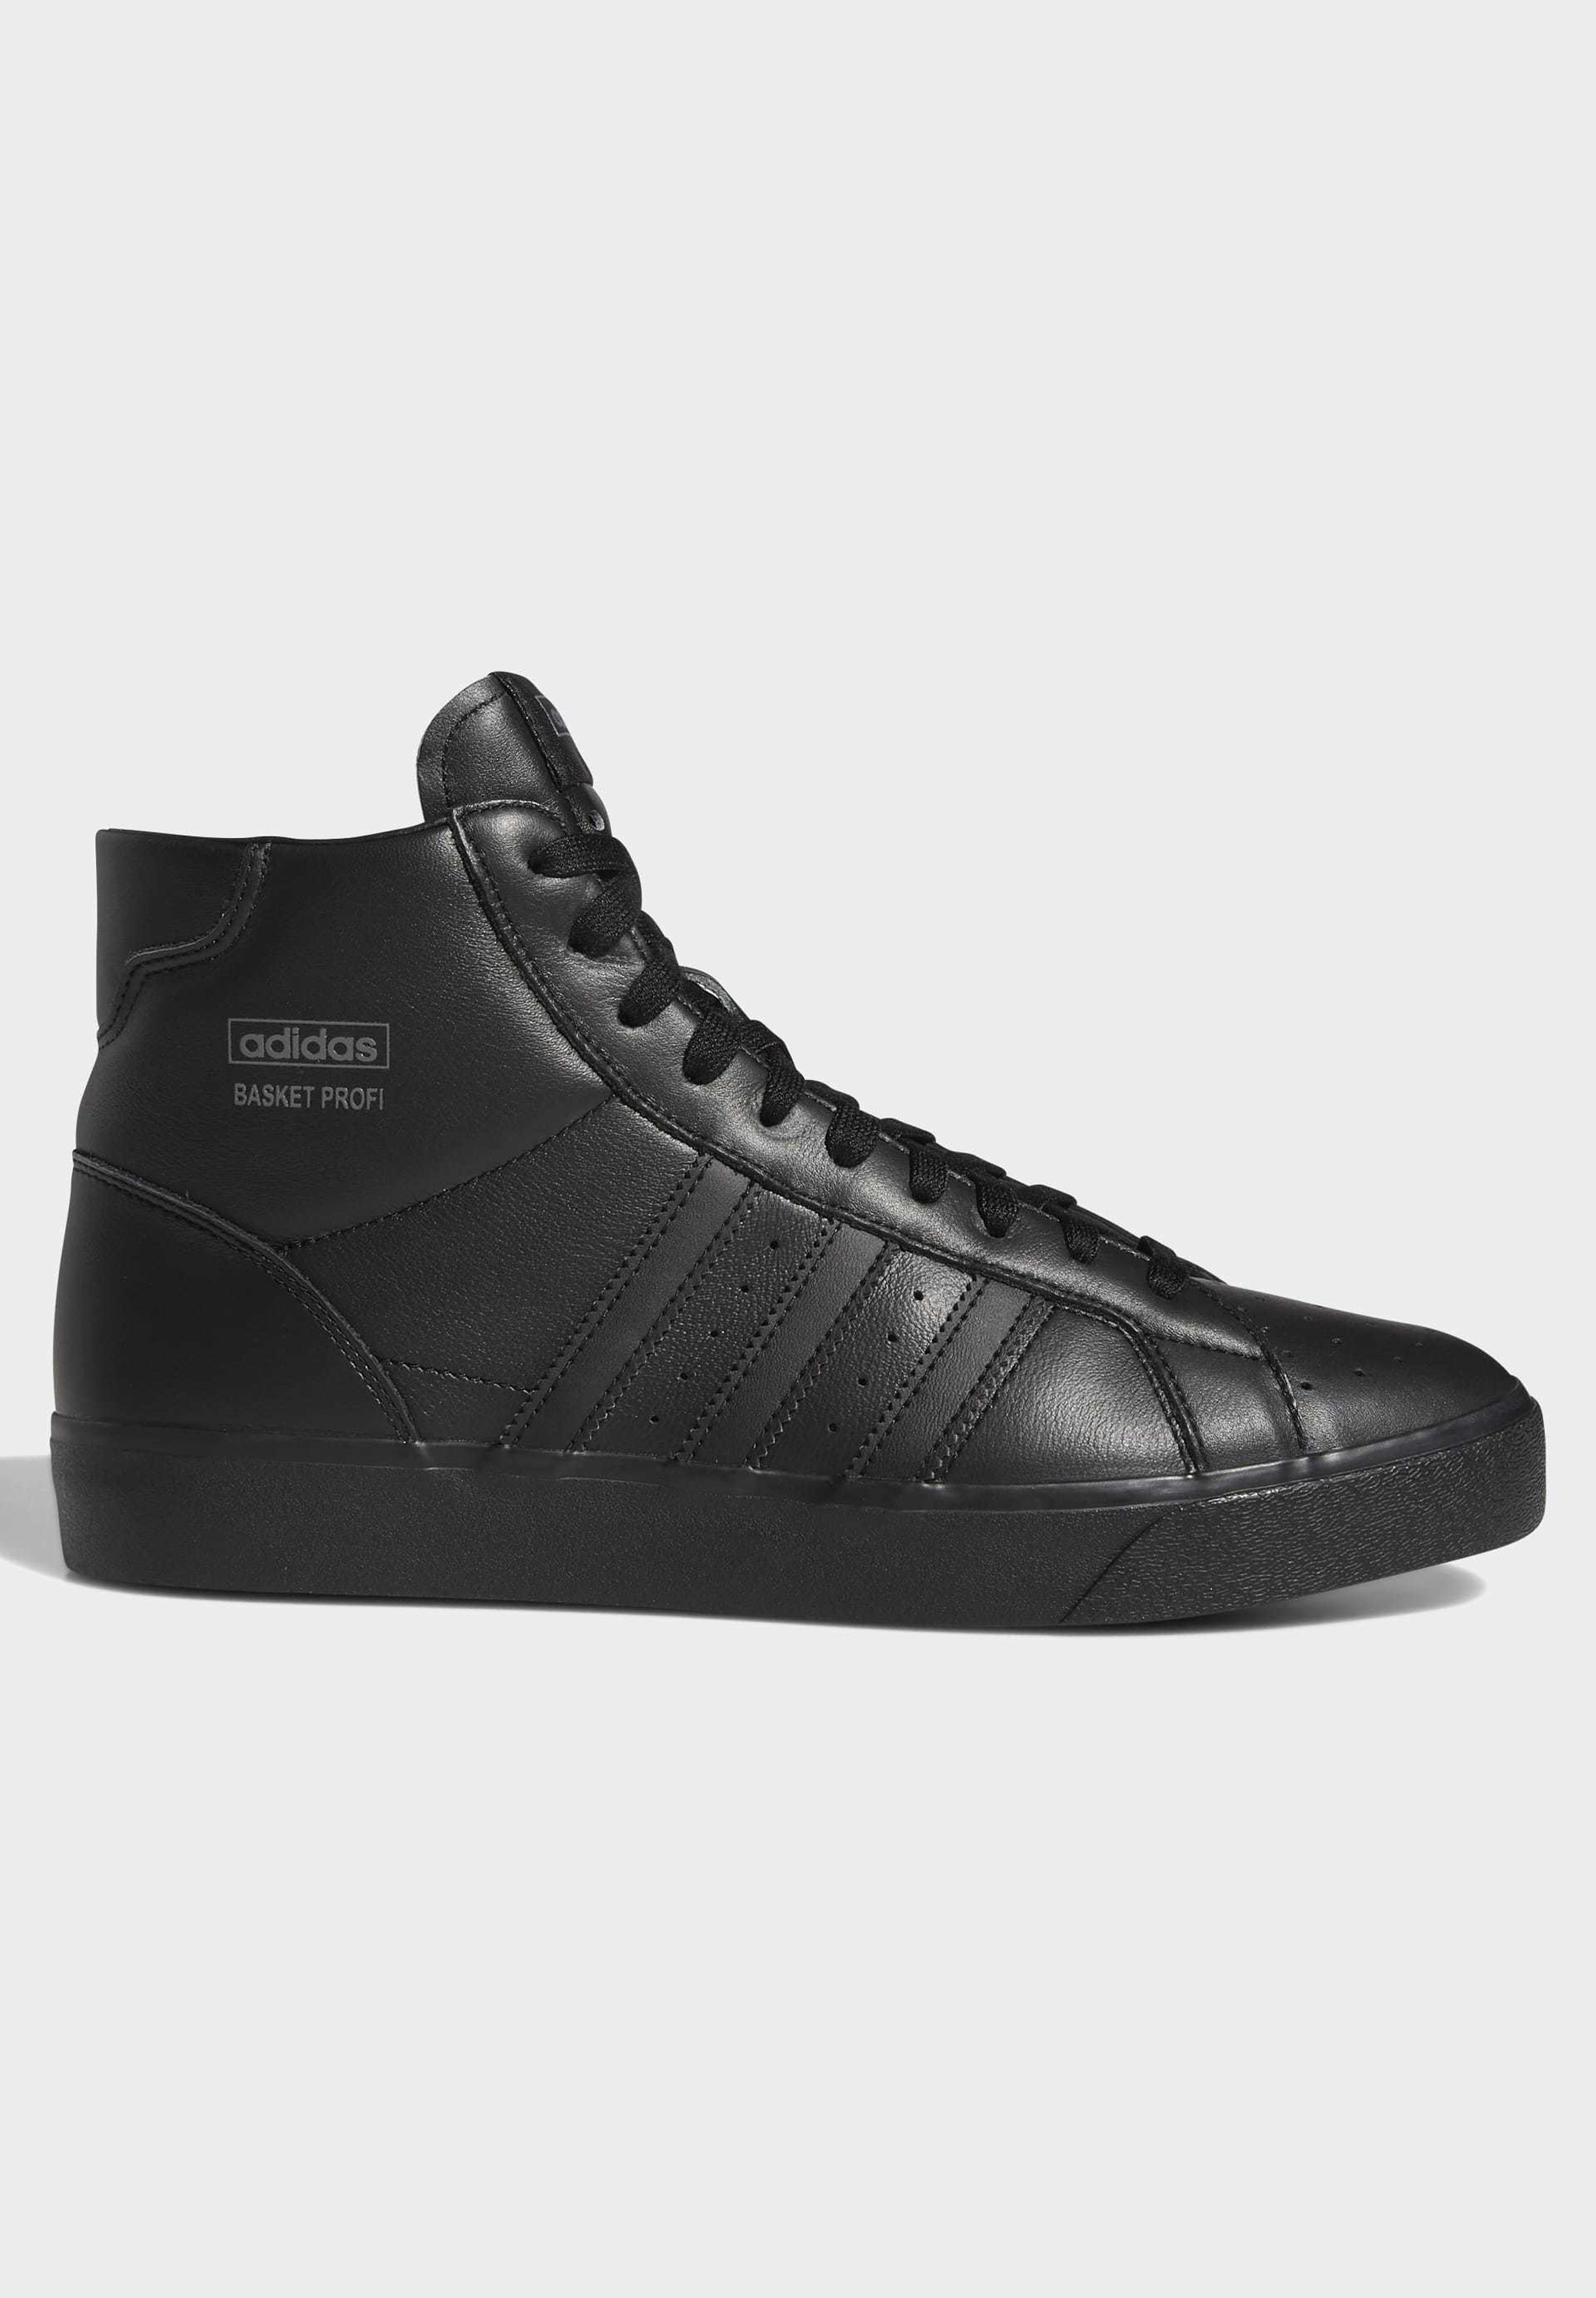 Geringster Preis adidas Originals BASKET PROFI - Sneaker low - black | Damenbekleidung 2020